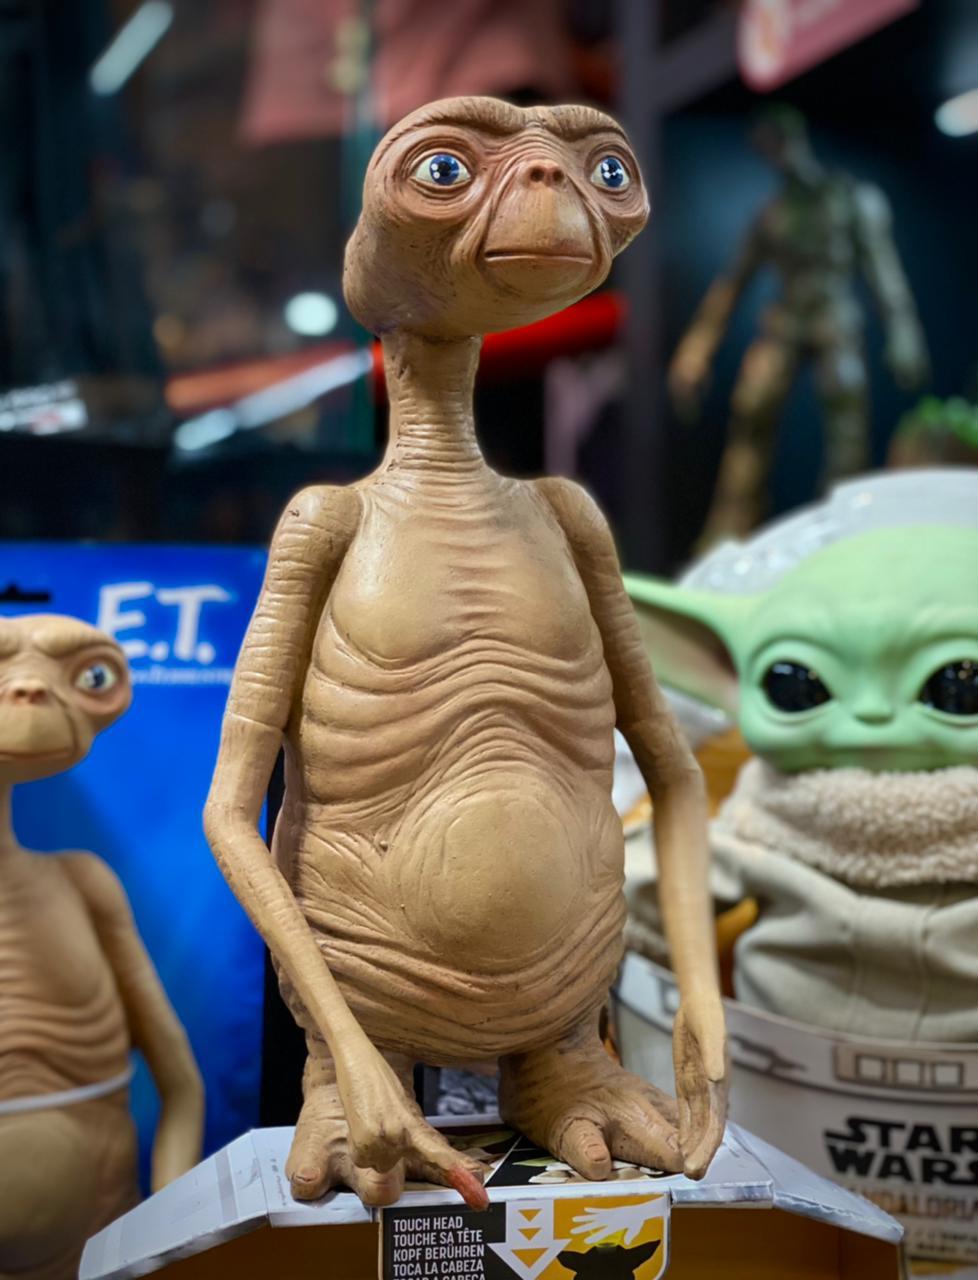 Réplica Brinquedo Figura E.T O Extraterrestre The Extra-Terrestrial 30cm - Neca